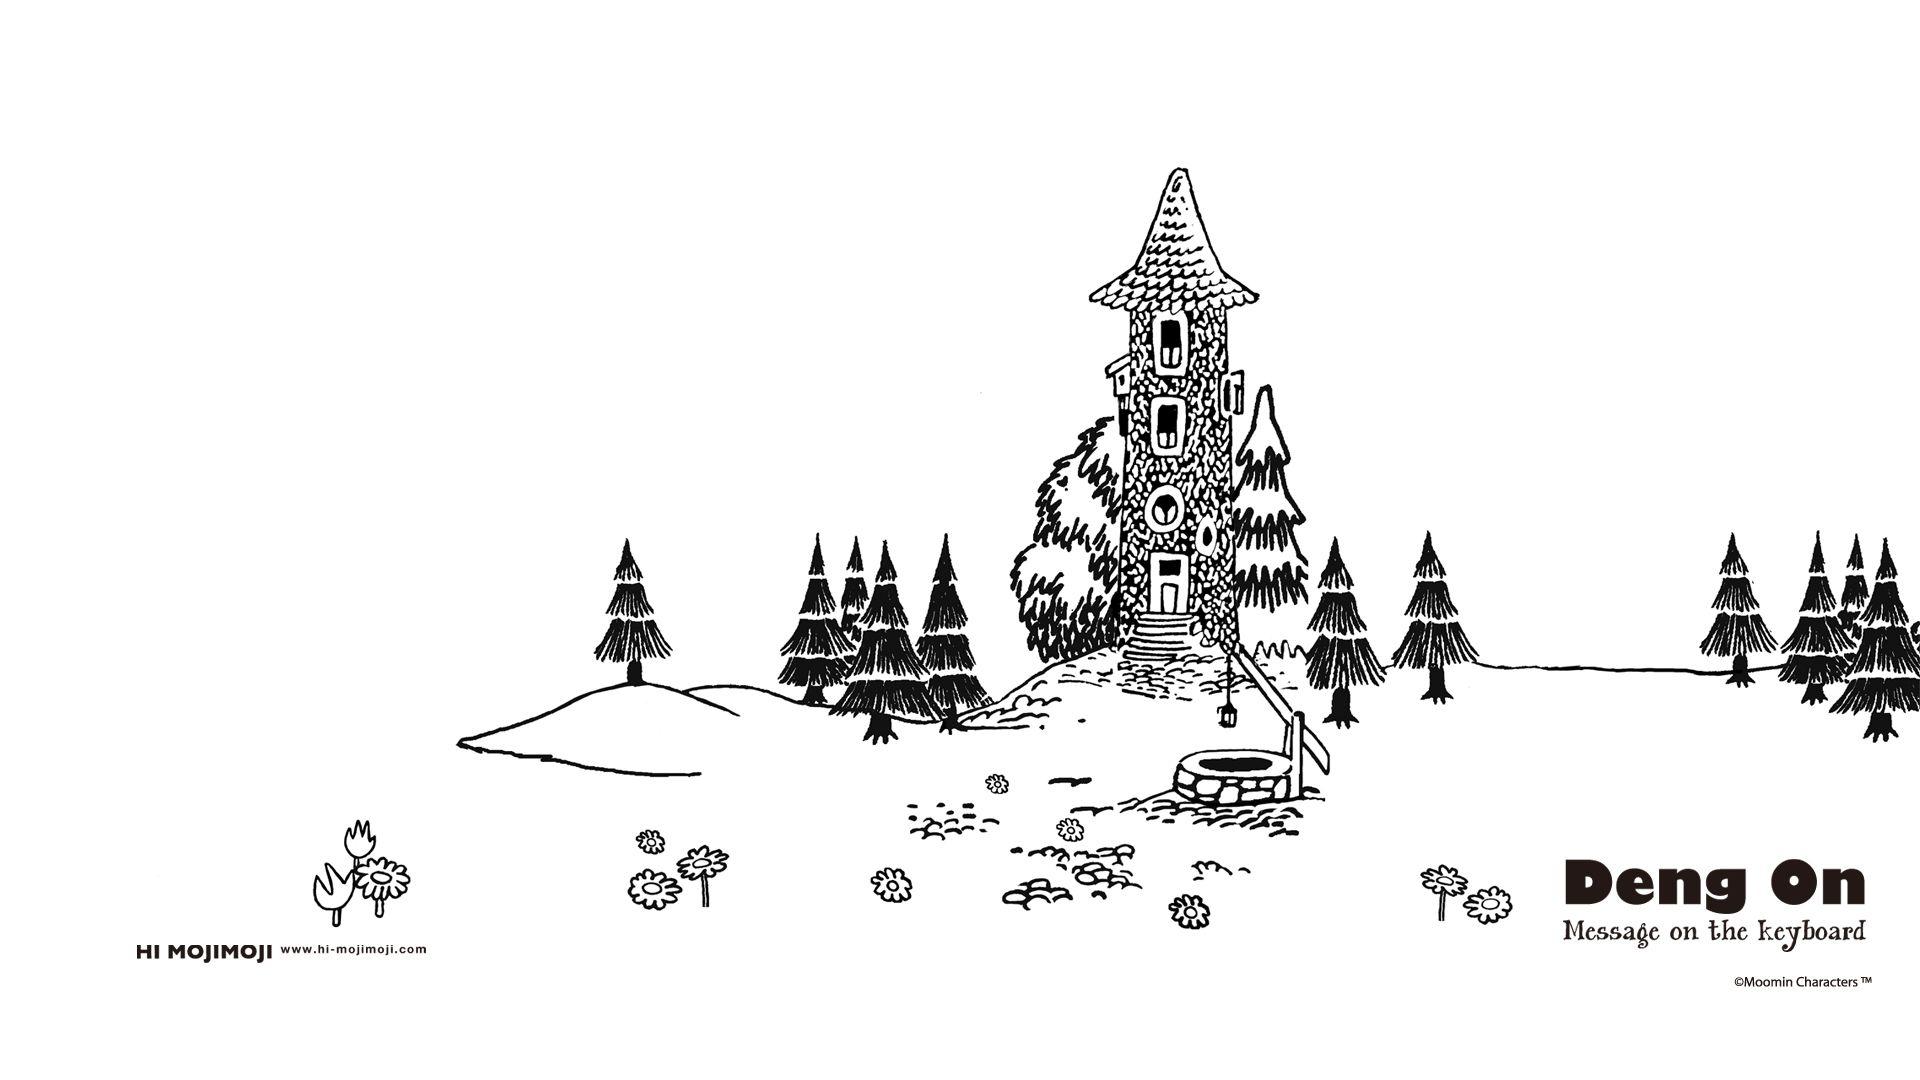 All Things Moomin スナフキン 壁紙 ムーミン公式サイト 壁紙 デスクトップ ムーミン 壁紙 デスクトップ 壁紙 おしゃれ